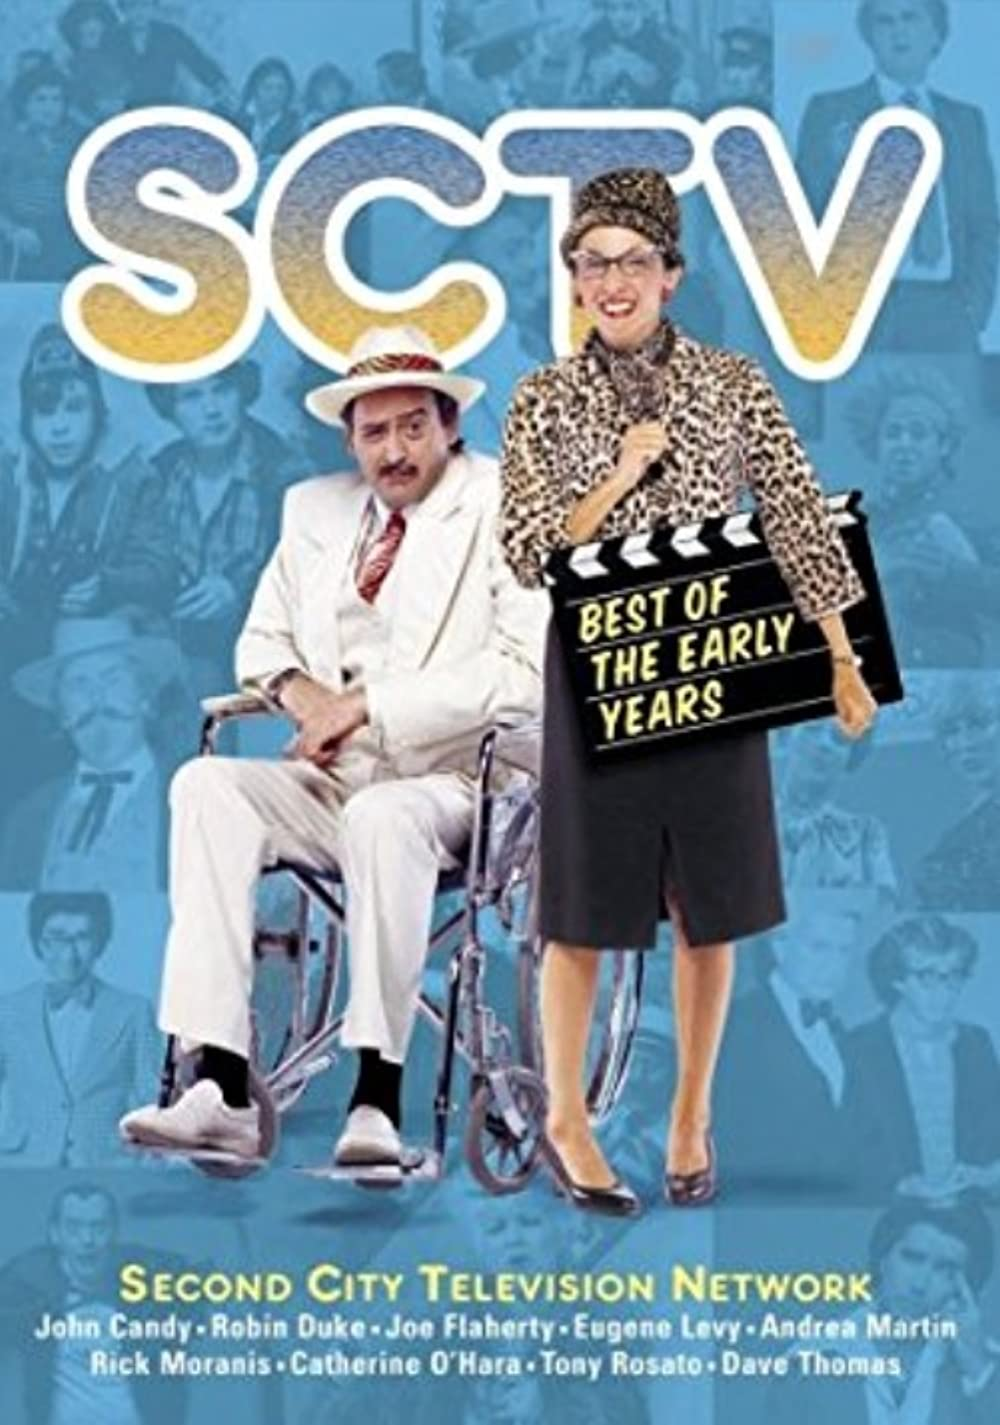 The Best of SCTV (TV Special 1988) - IMDb